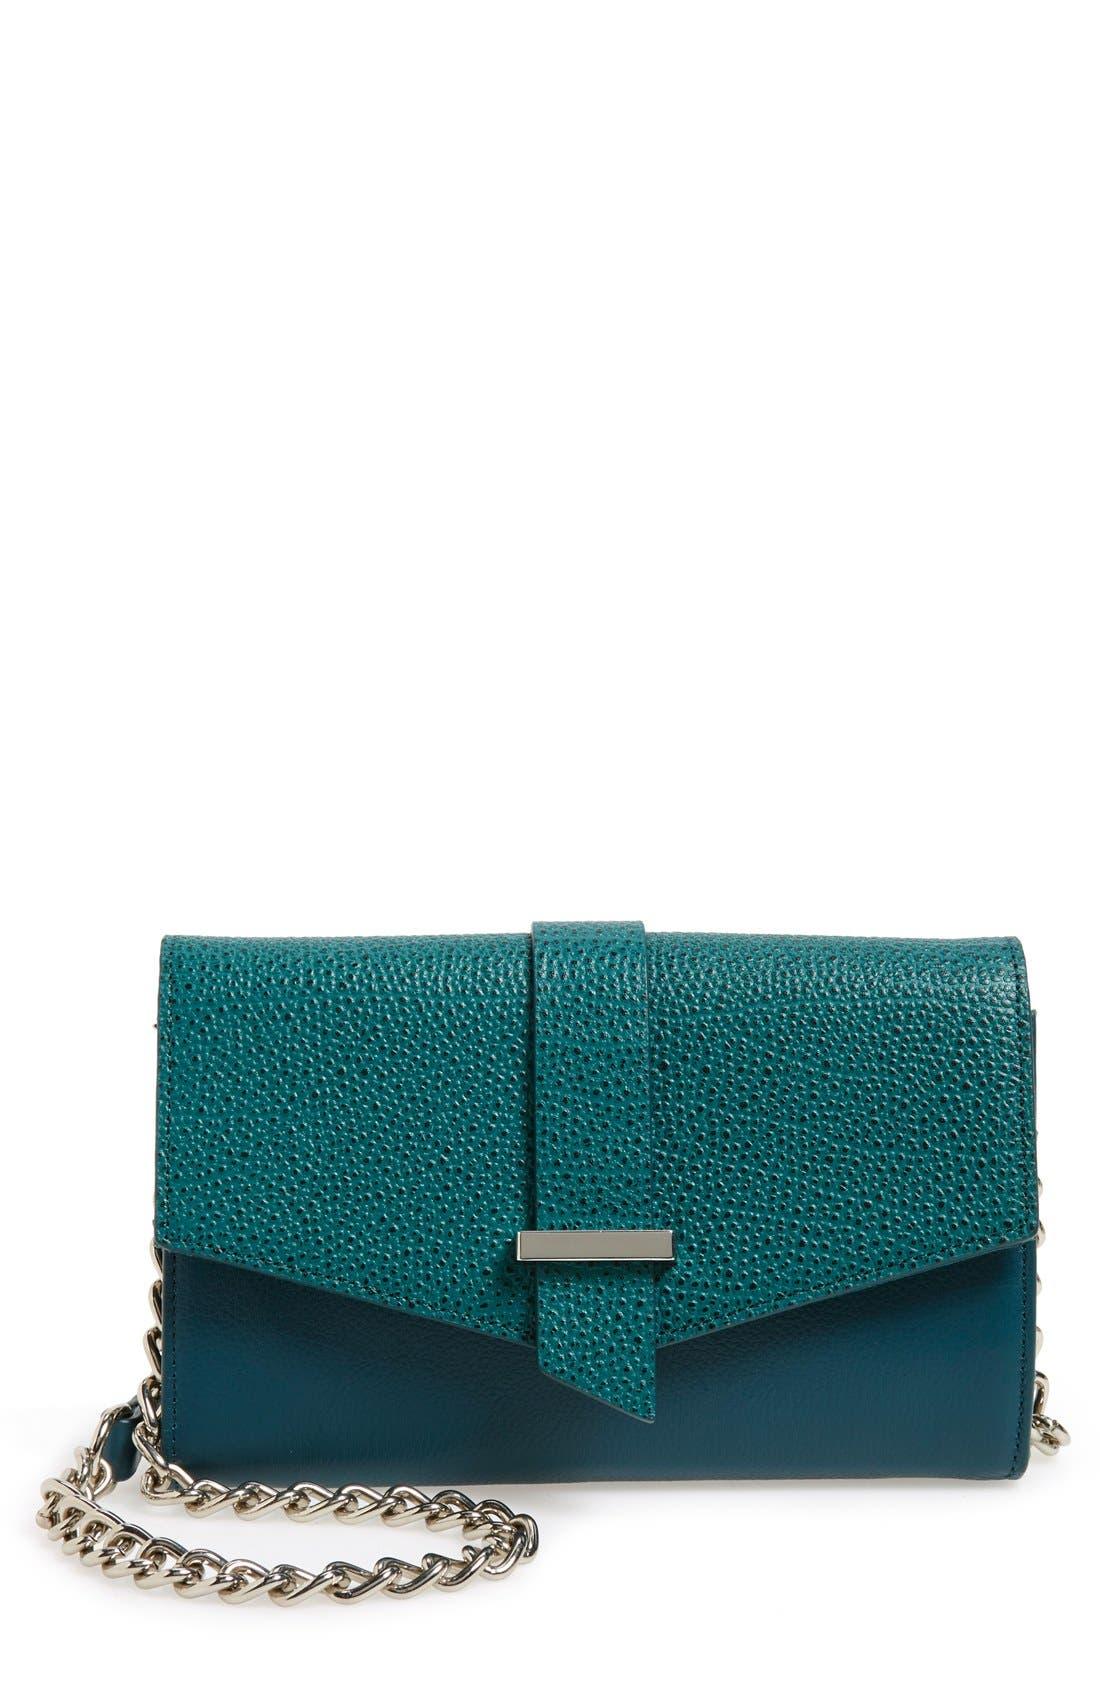 Alternate Image 1 Selected - Halogen® 'Belltown' Leather Crossbody Bag